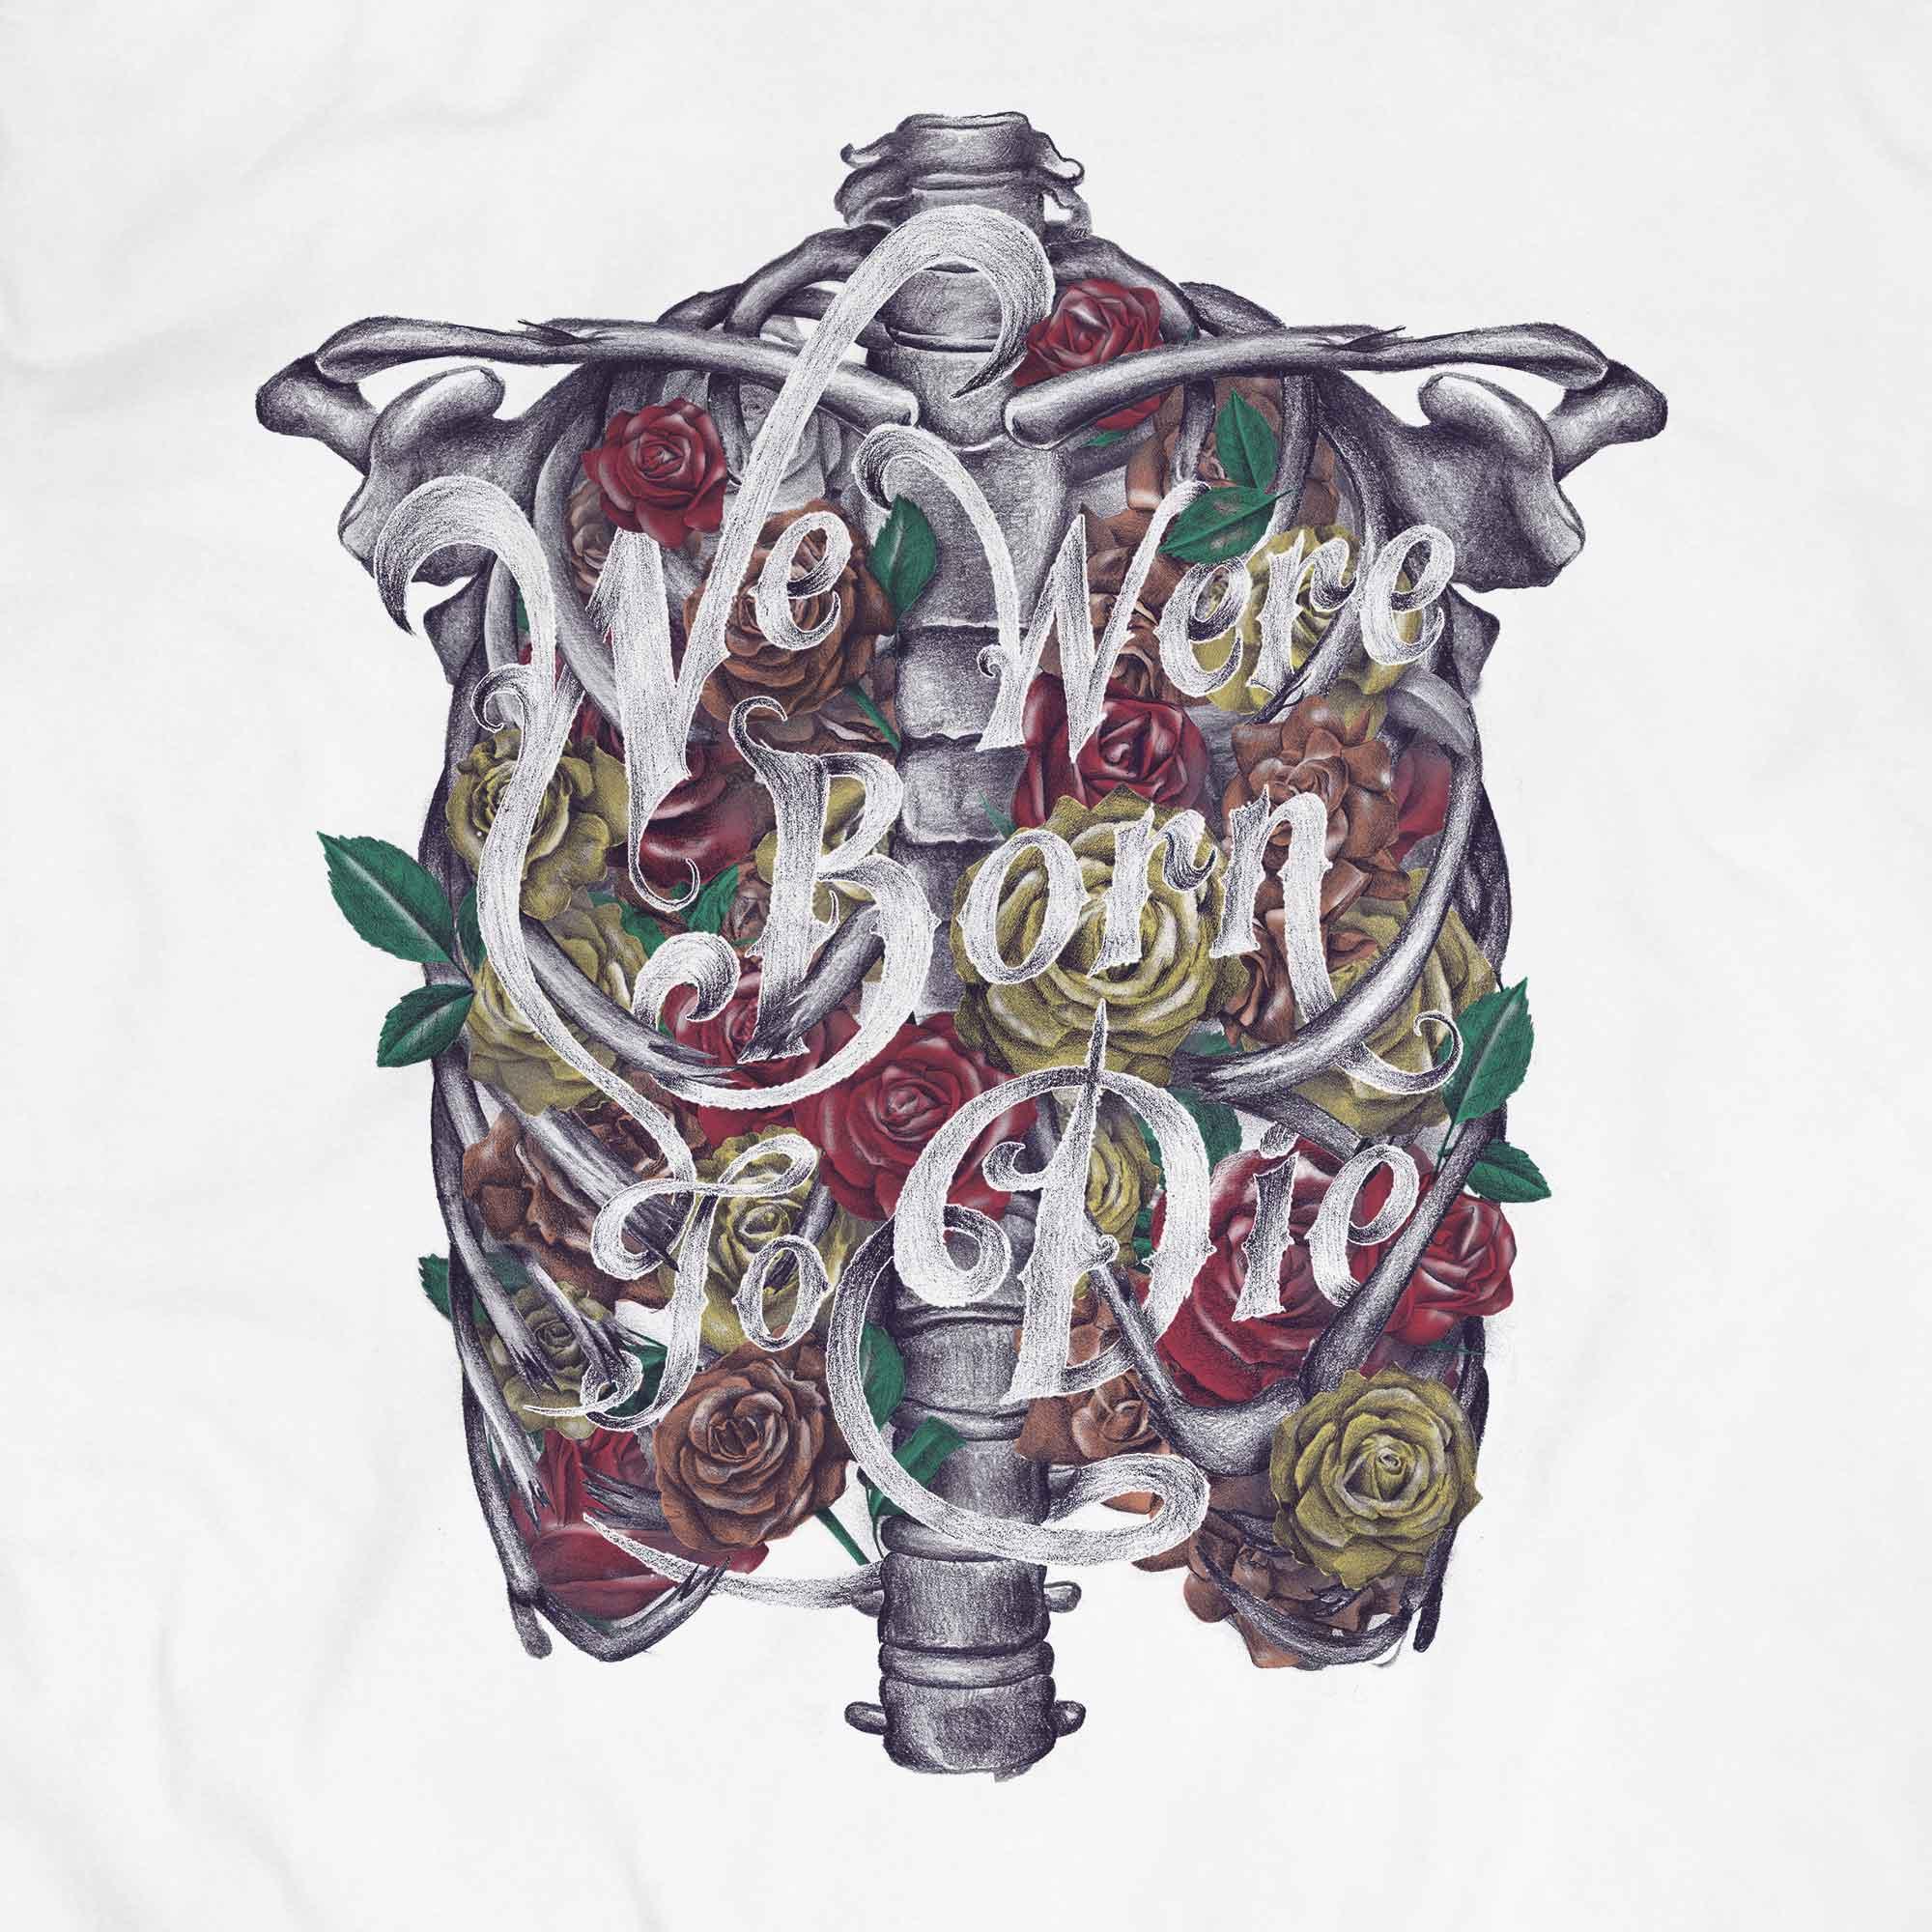 Camiseta Lana Del Rey - Born To Die - Masculino